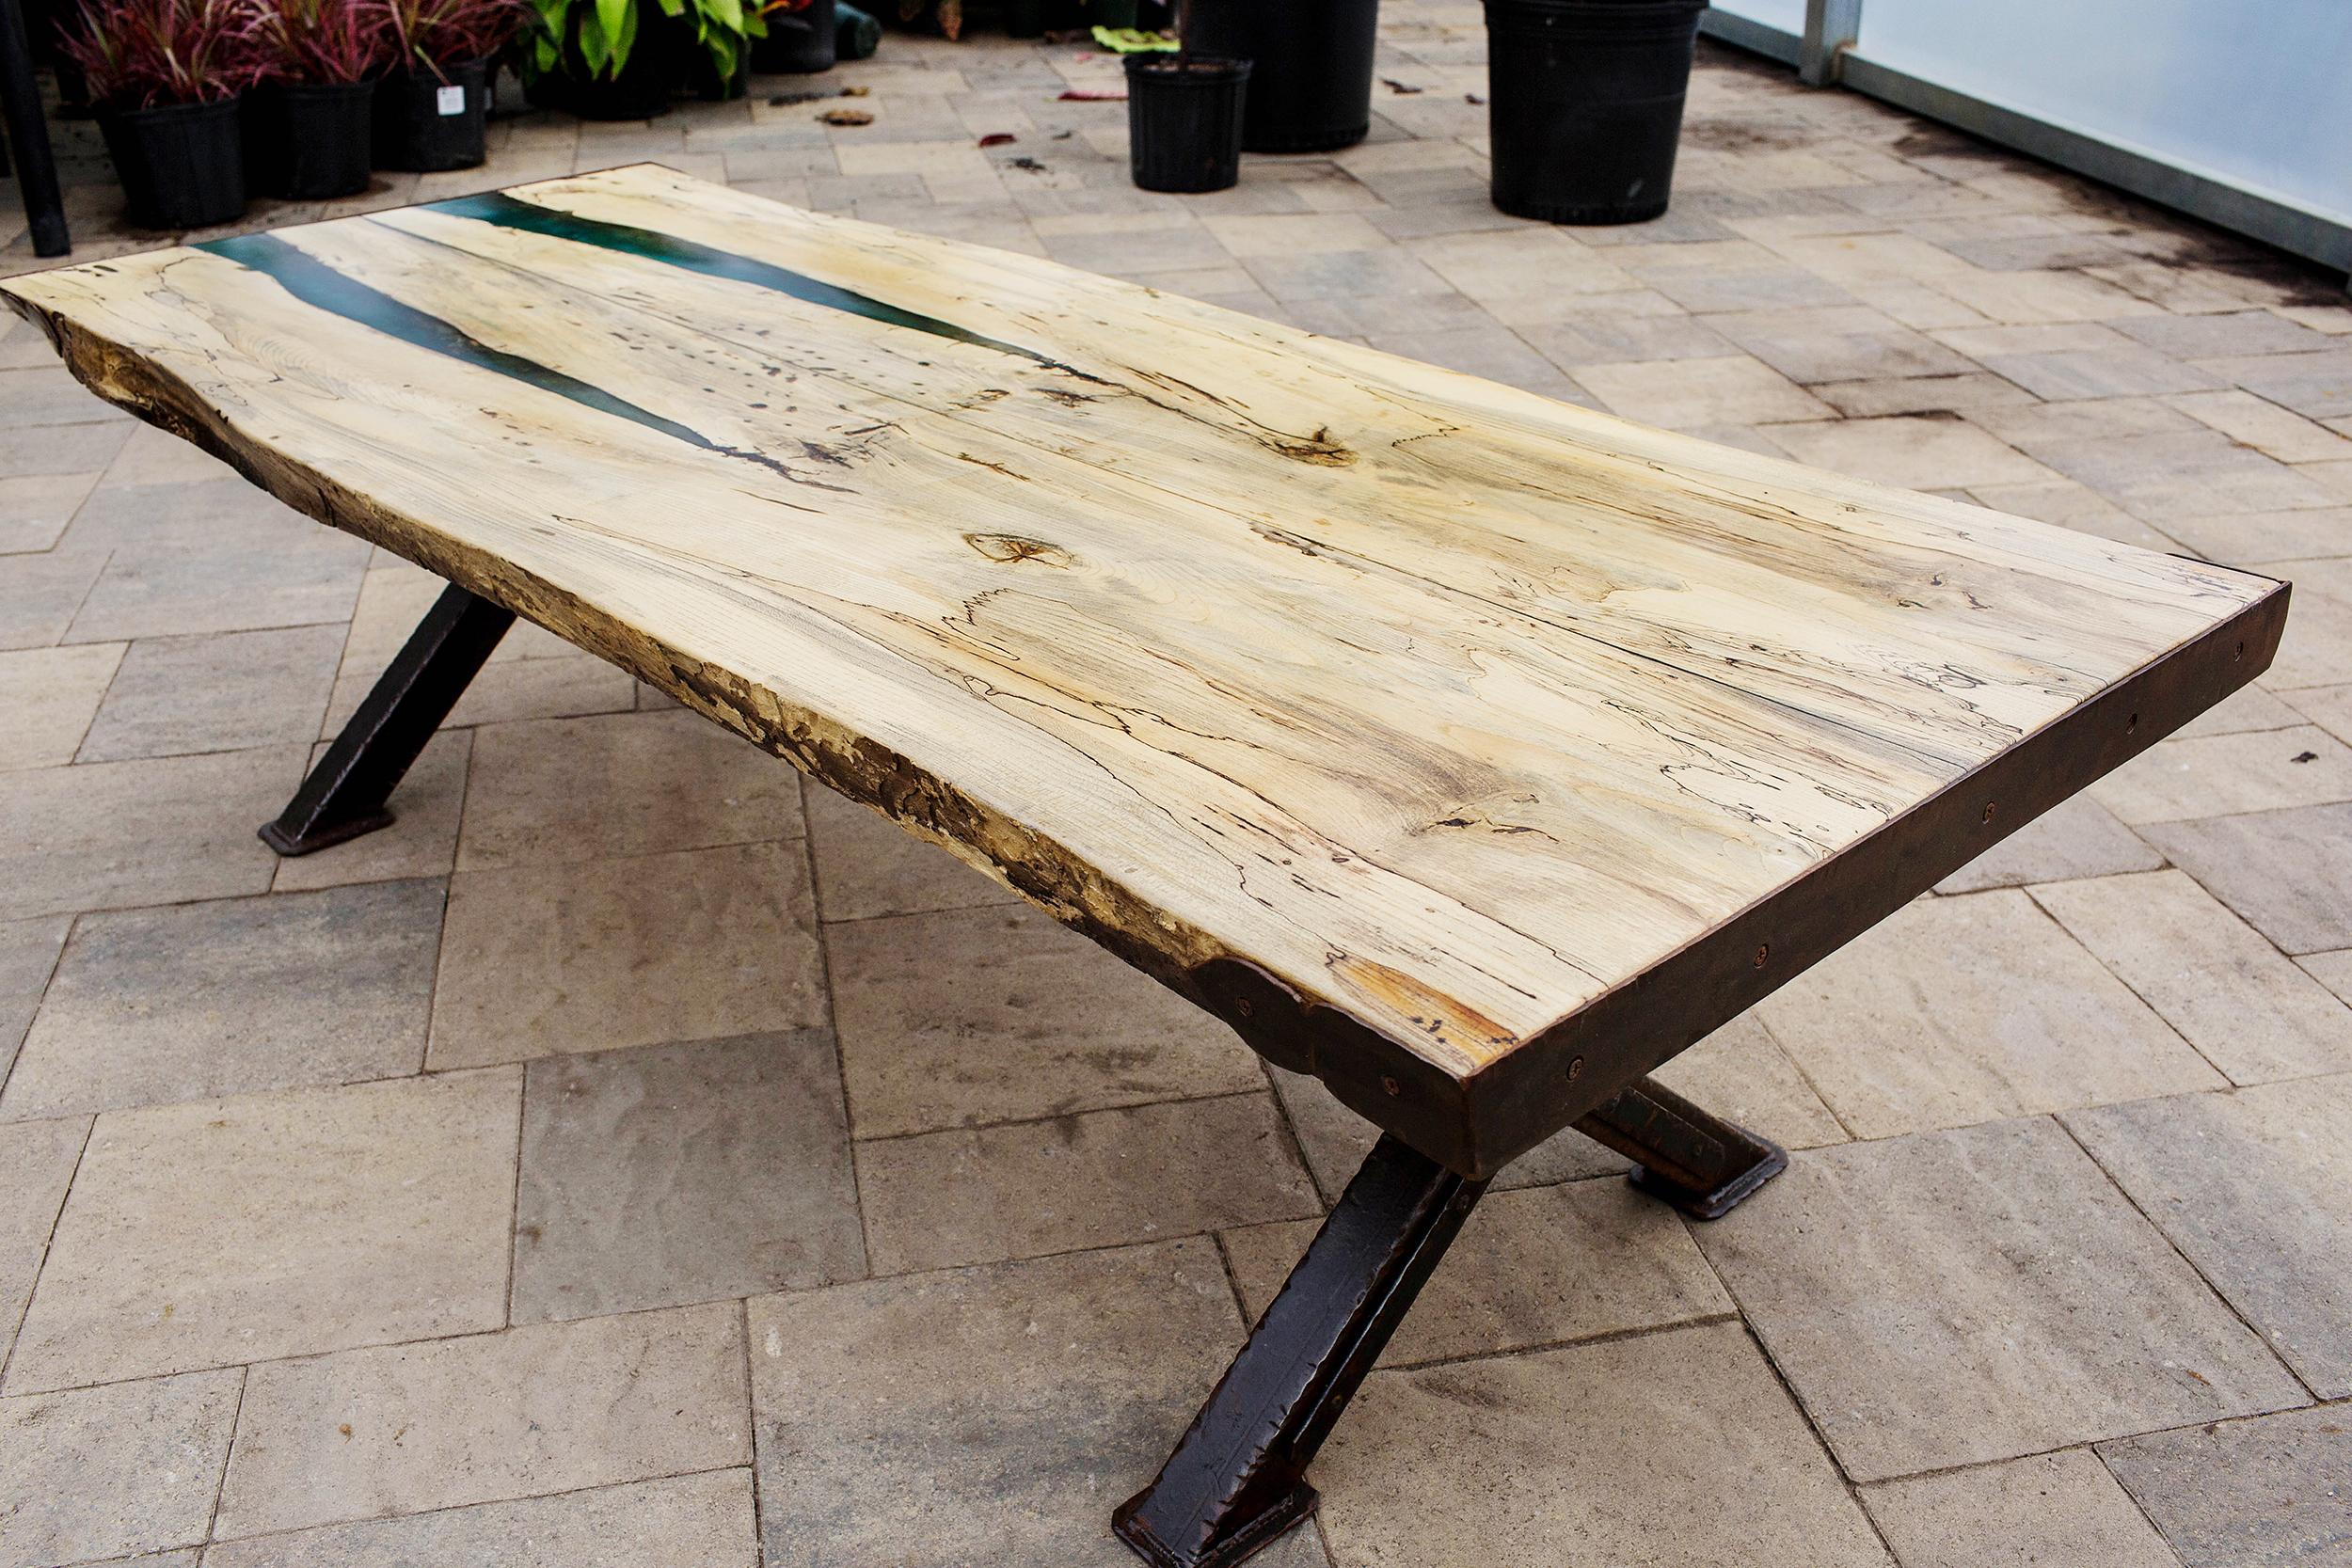 Live Edge Wood Furniture in DFW Texas (252 of 304).jpg